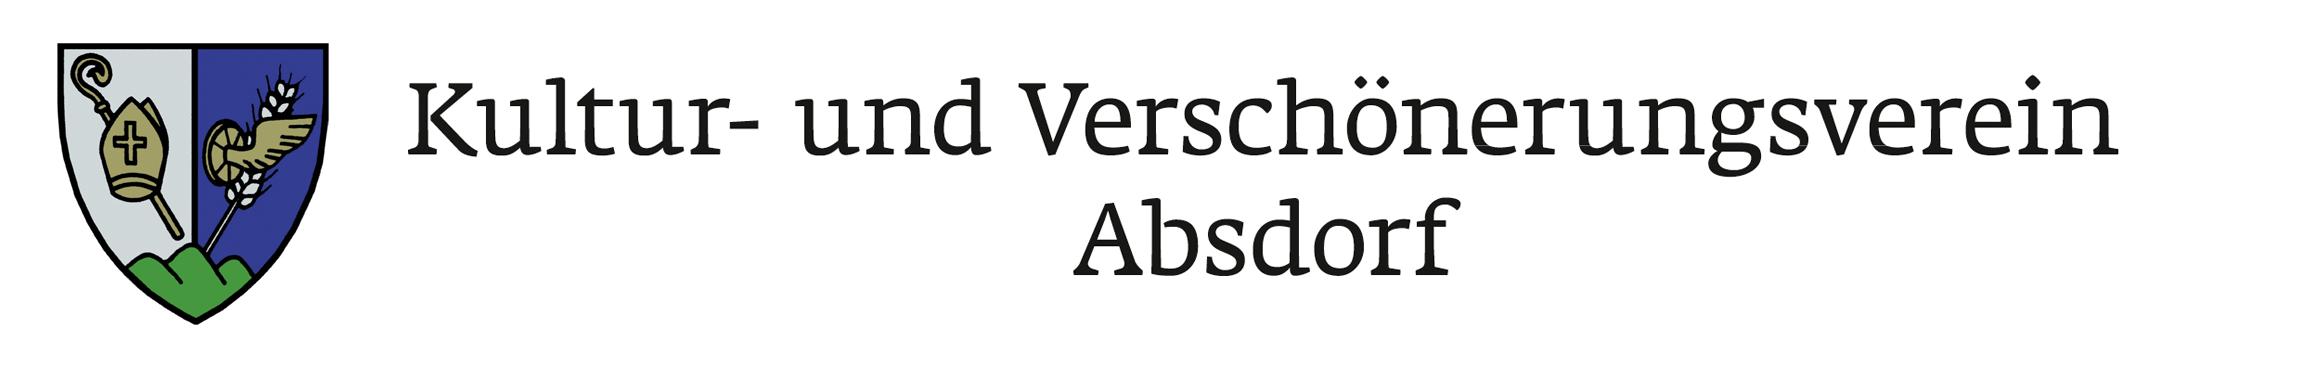 KVV Absdorf